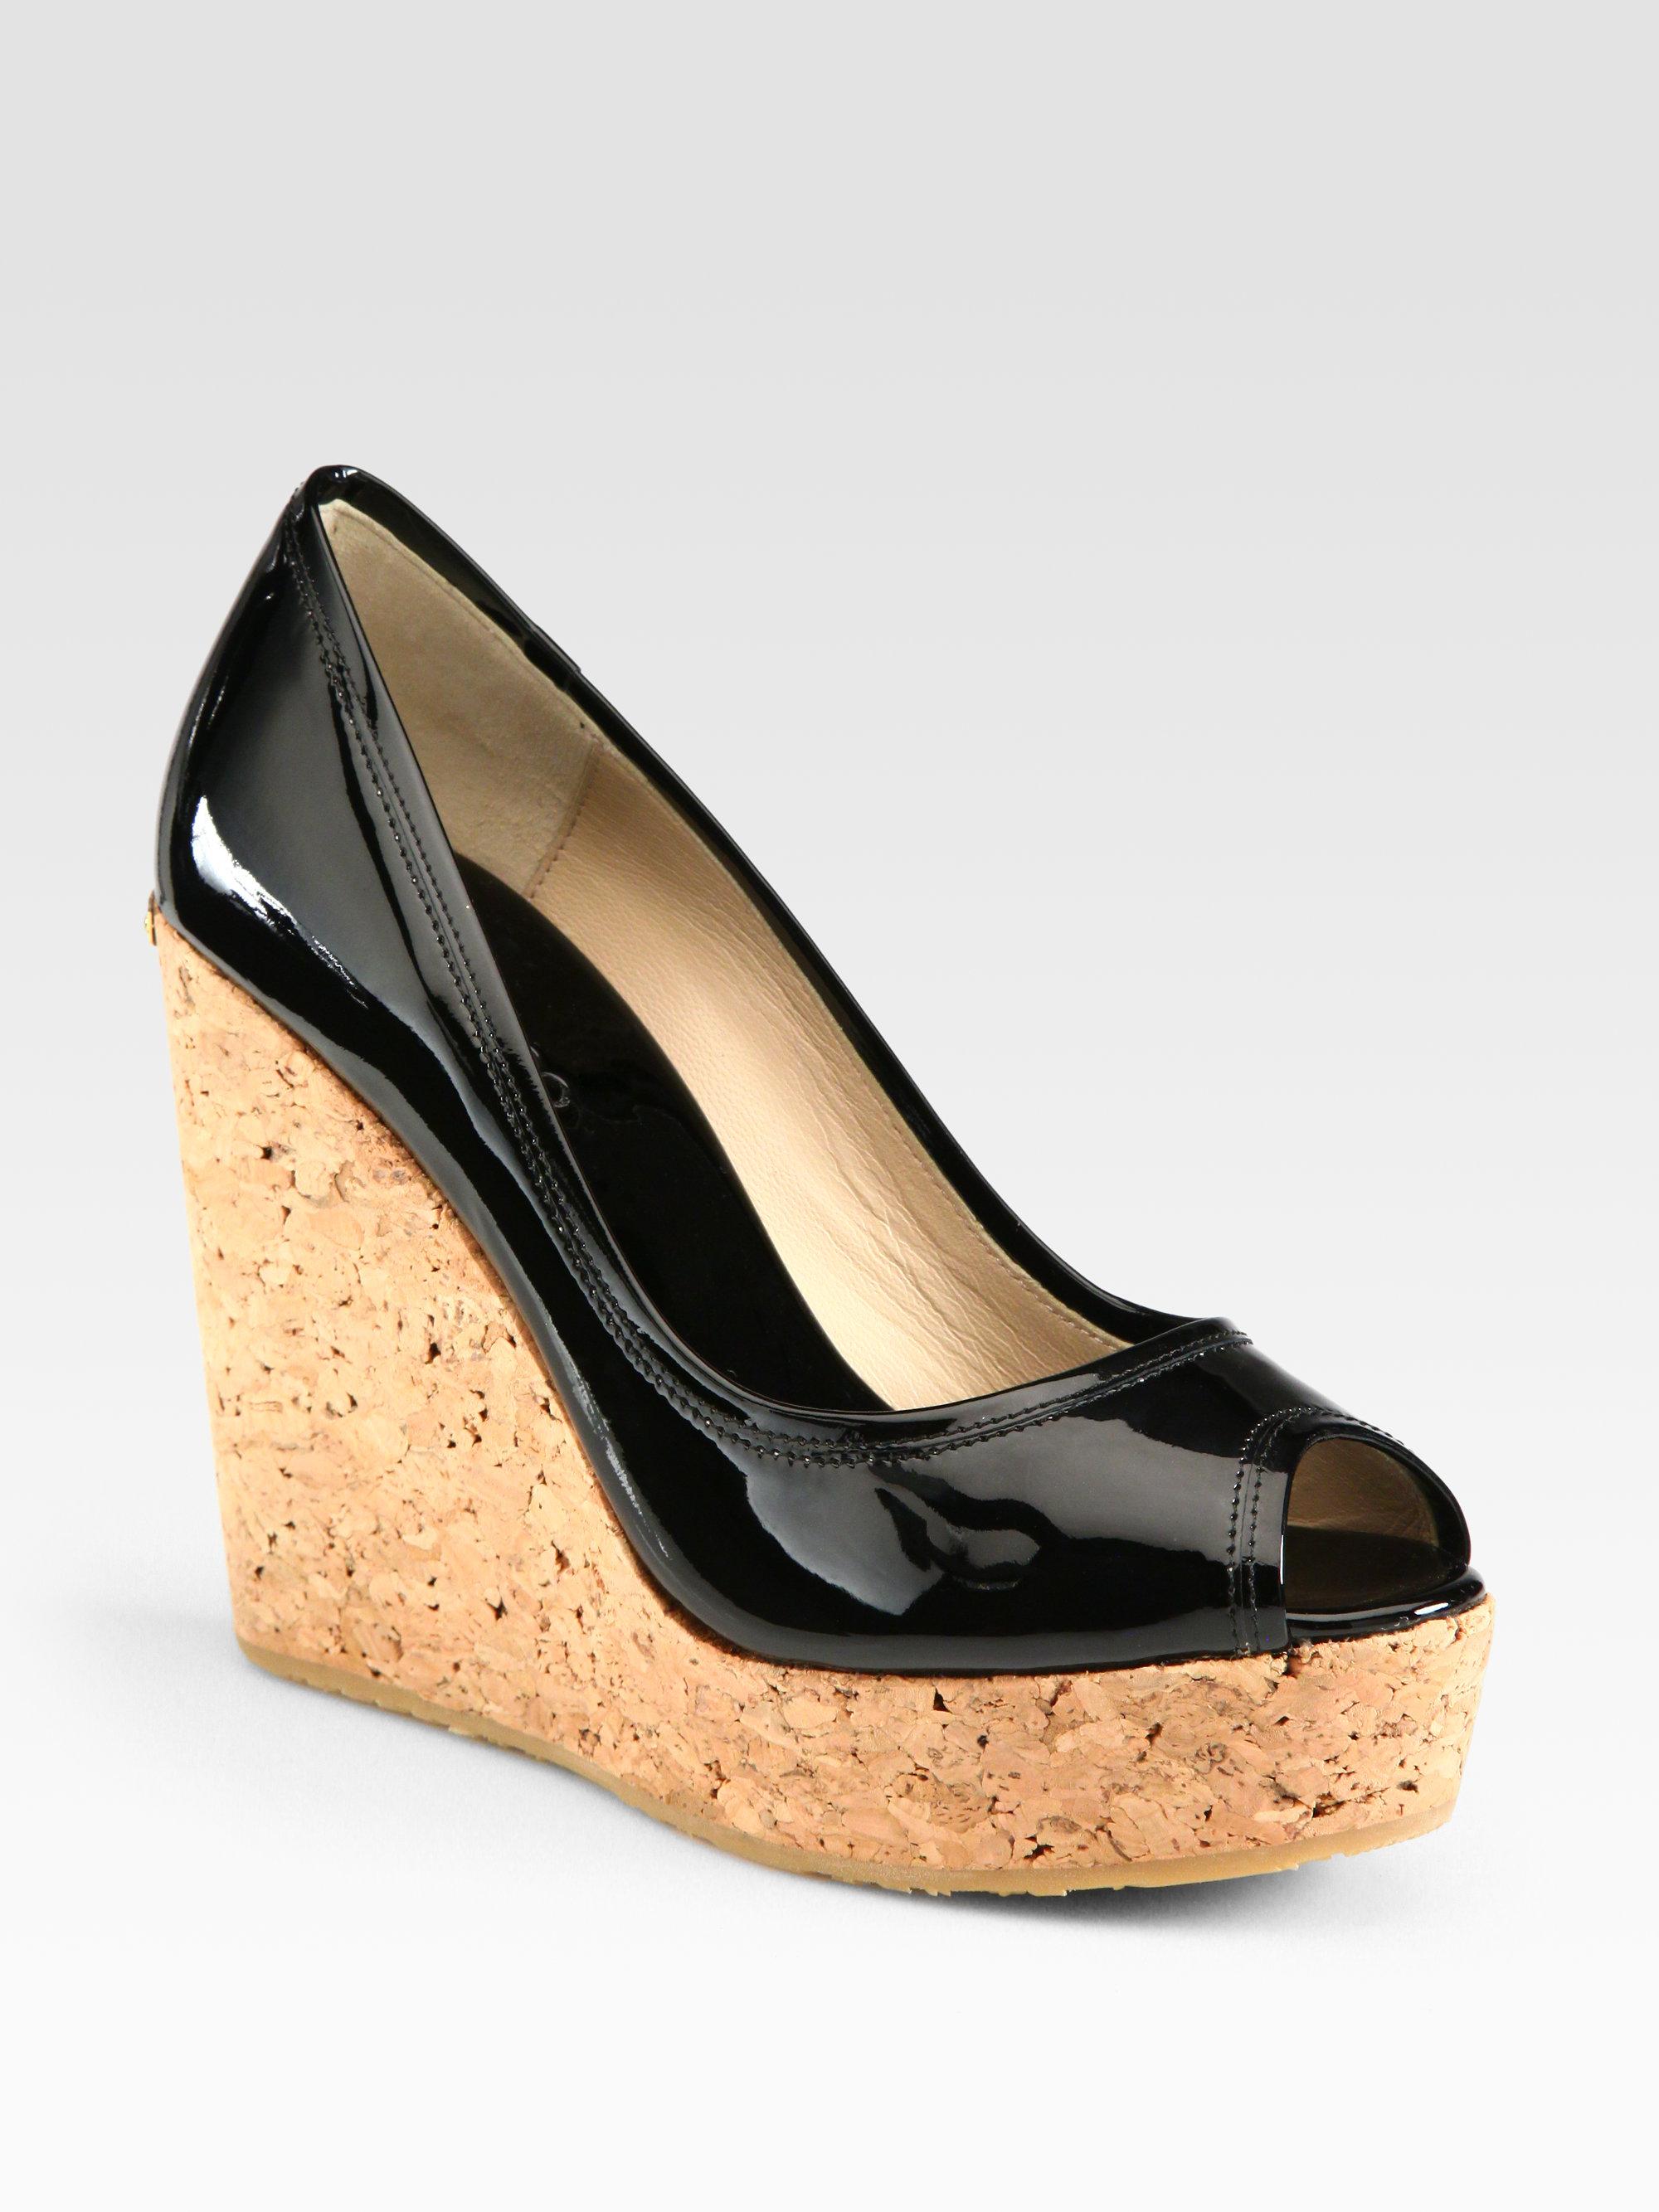 0c3d408da73 ... sale lyst jimmy choo papina patent leather wedge sandals in black 63f3d  ac35b